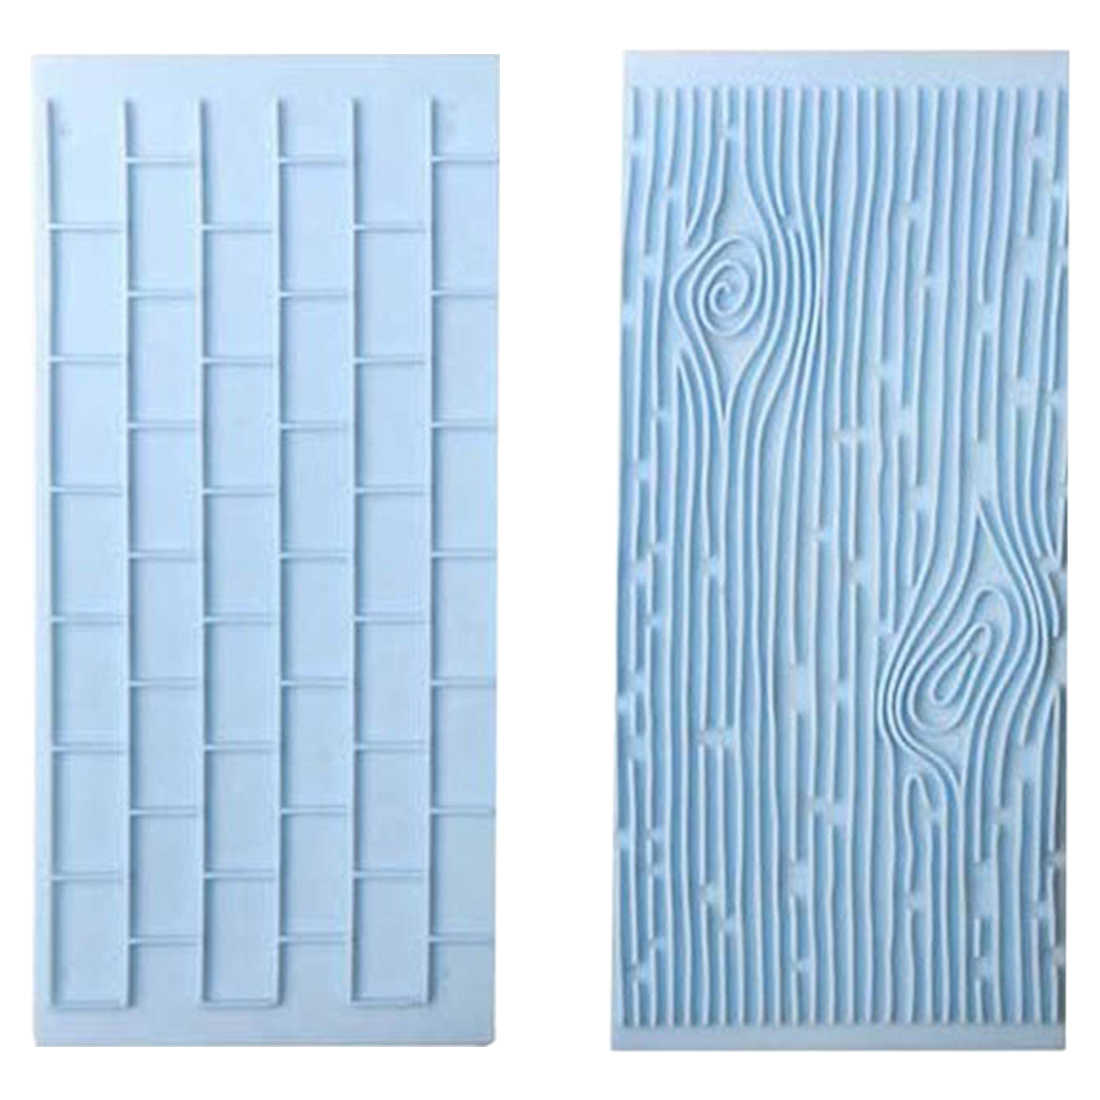 2PCS/Set Tree Bark Brick Wall Bakeware Tools Silicone Food Grade Texture Kitchen Accessories Cake Decorating Fondant Mold